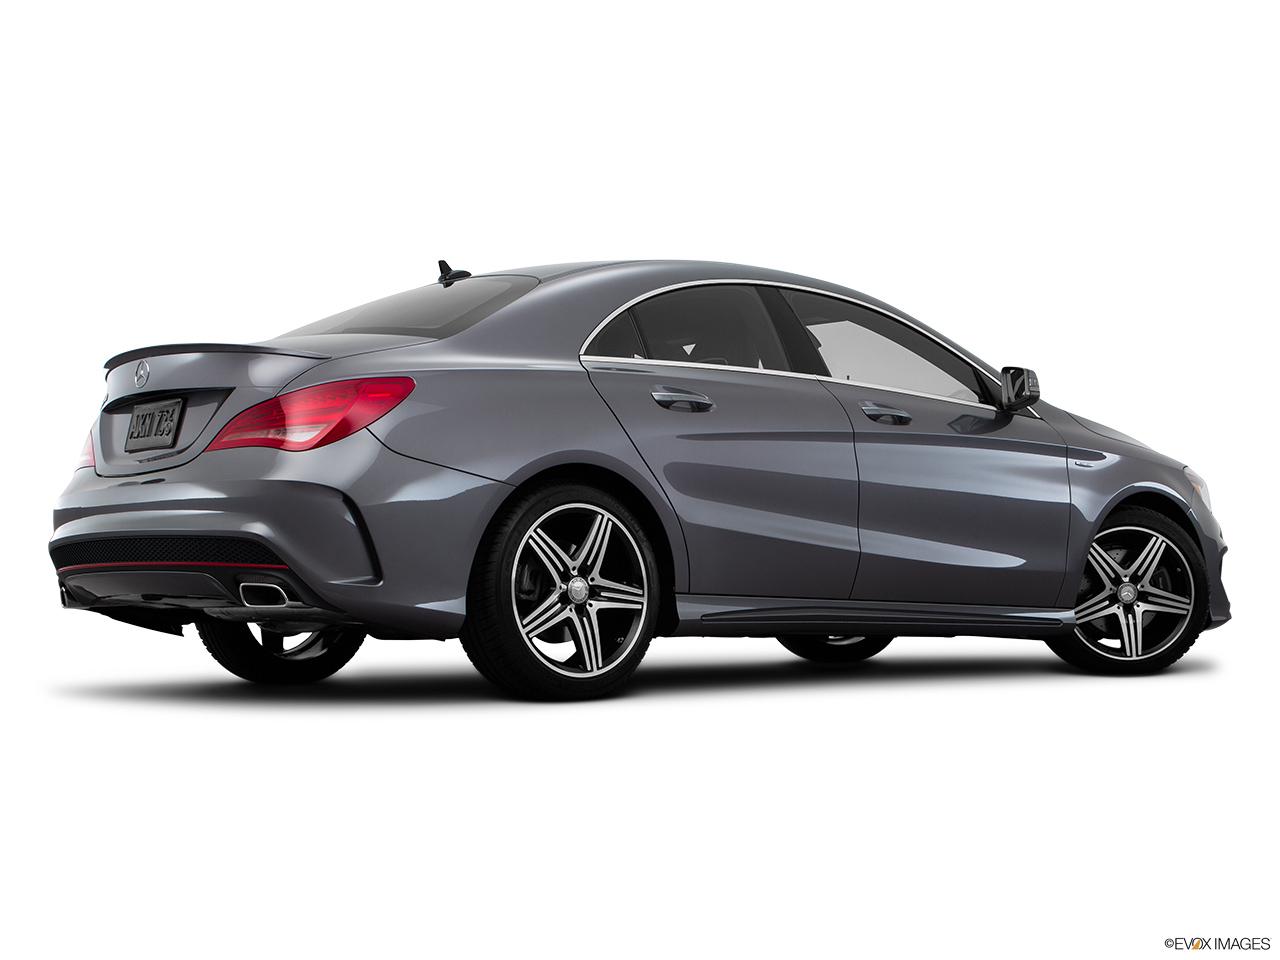 car pictures list for mercedes benz cla class 2016 cla 250. Black Bedroom Furniture Sets. Home Design Ideas